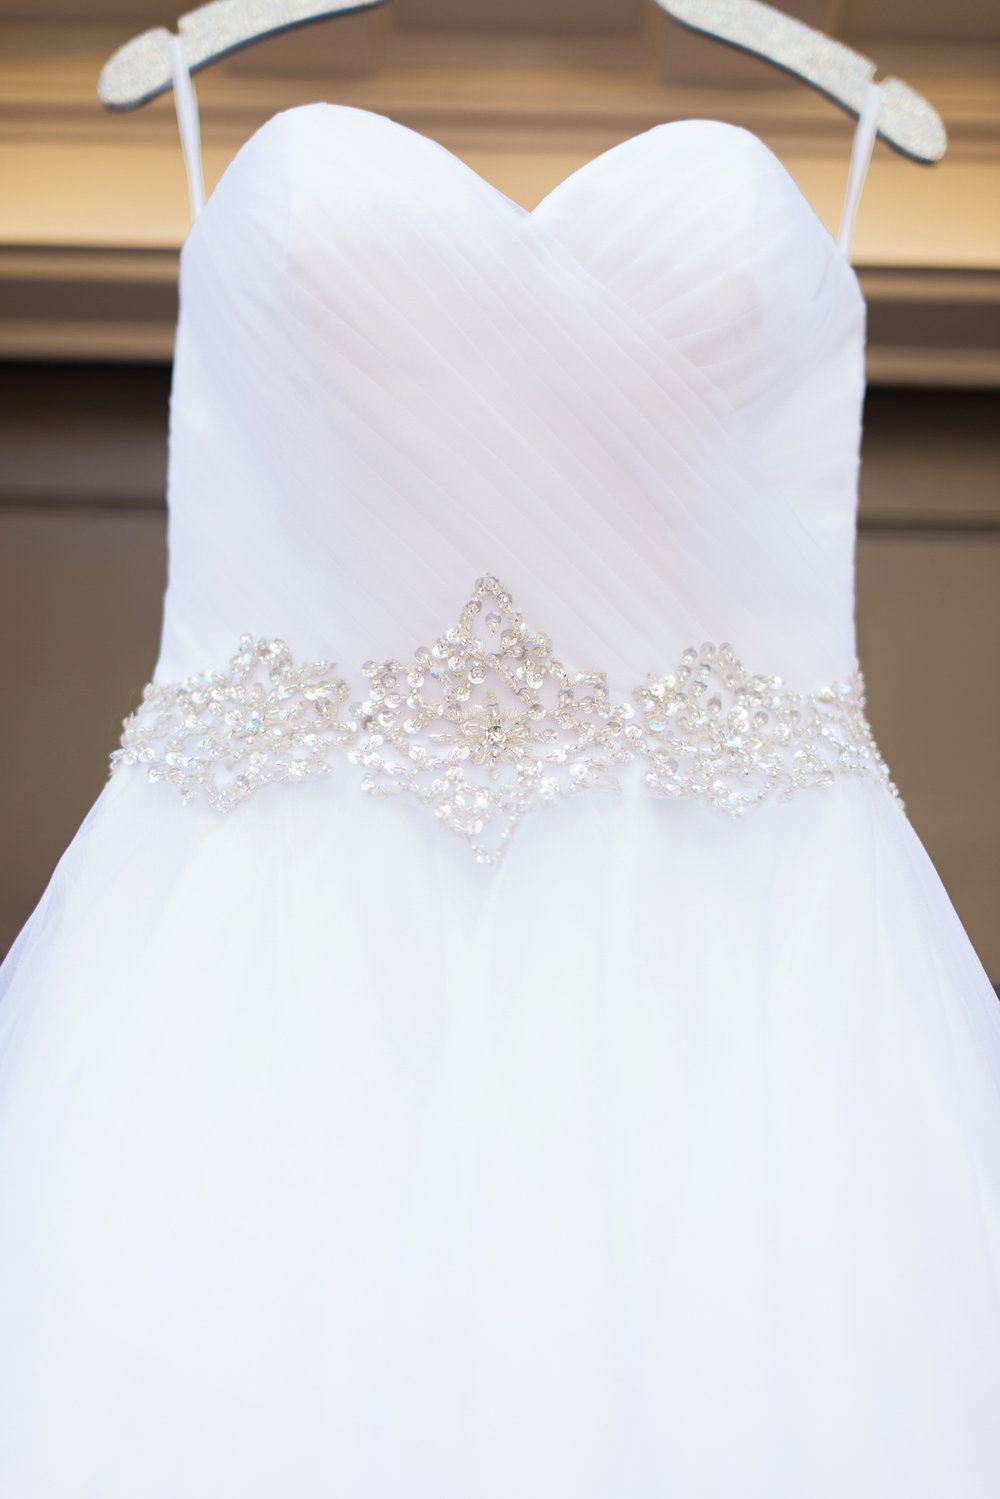 romantic-vintage-wedding-urban-venue-wedding-gown-detail.jpg